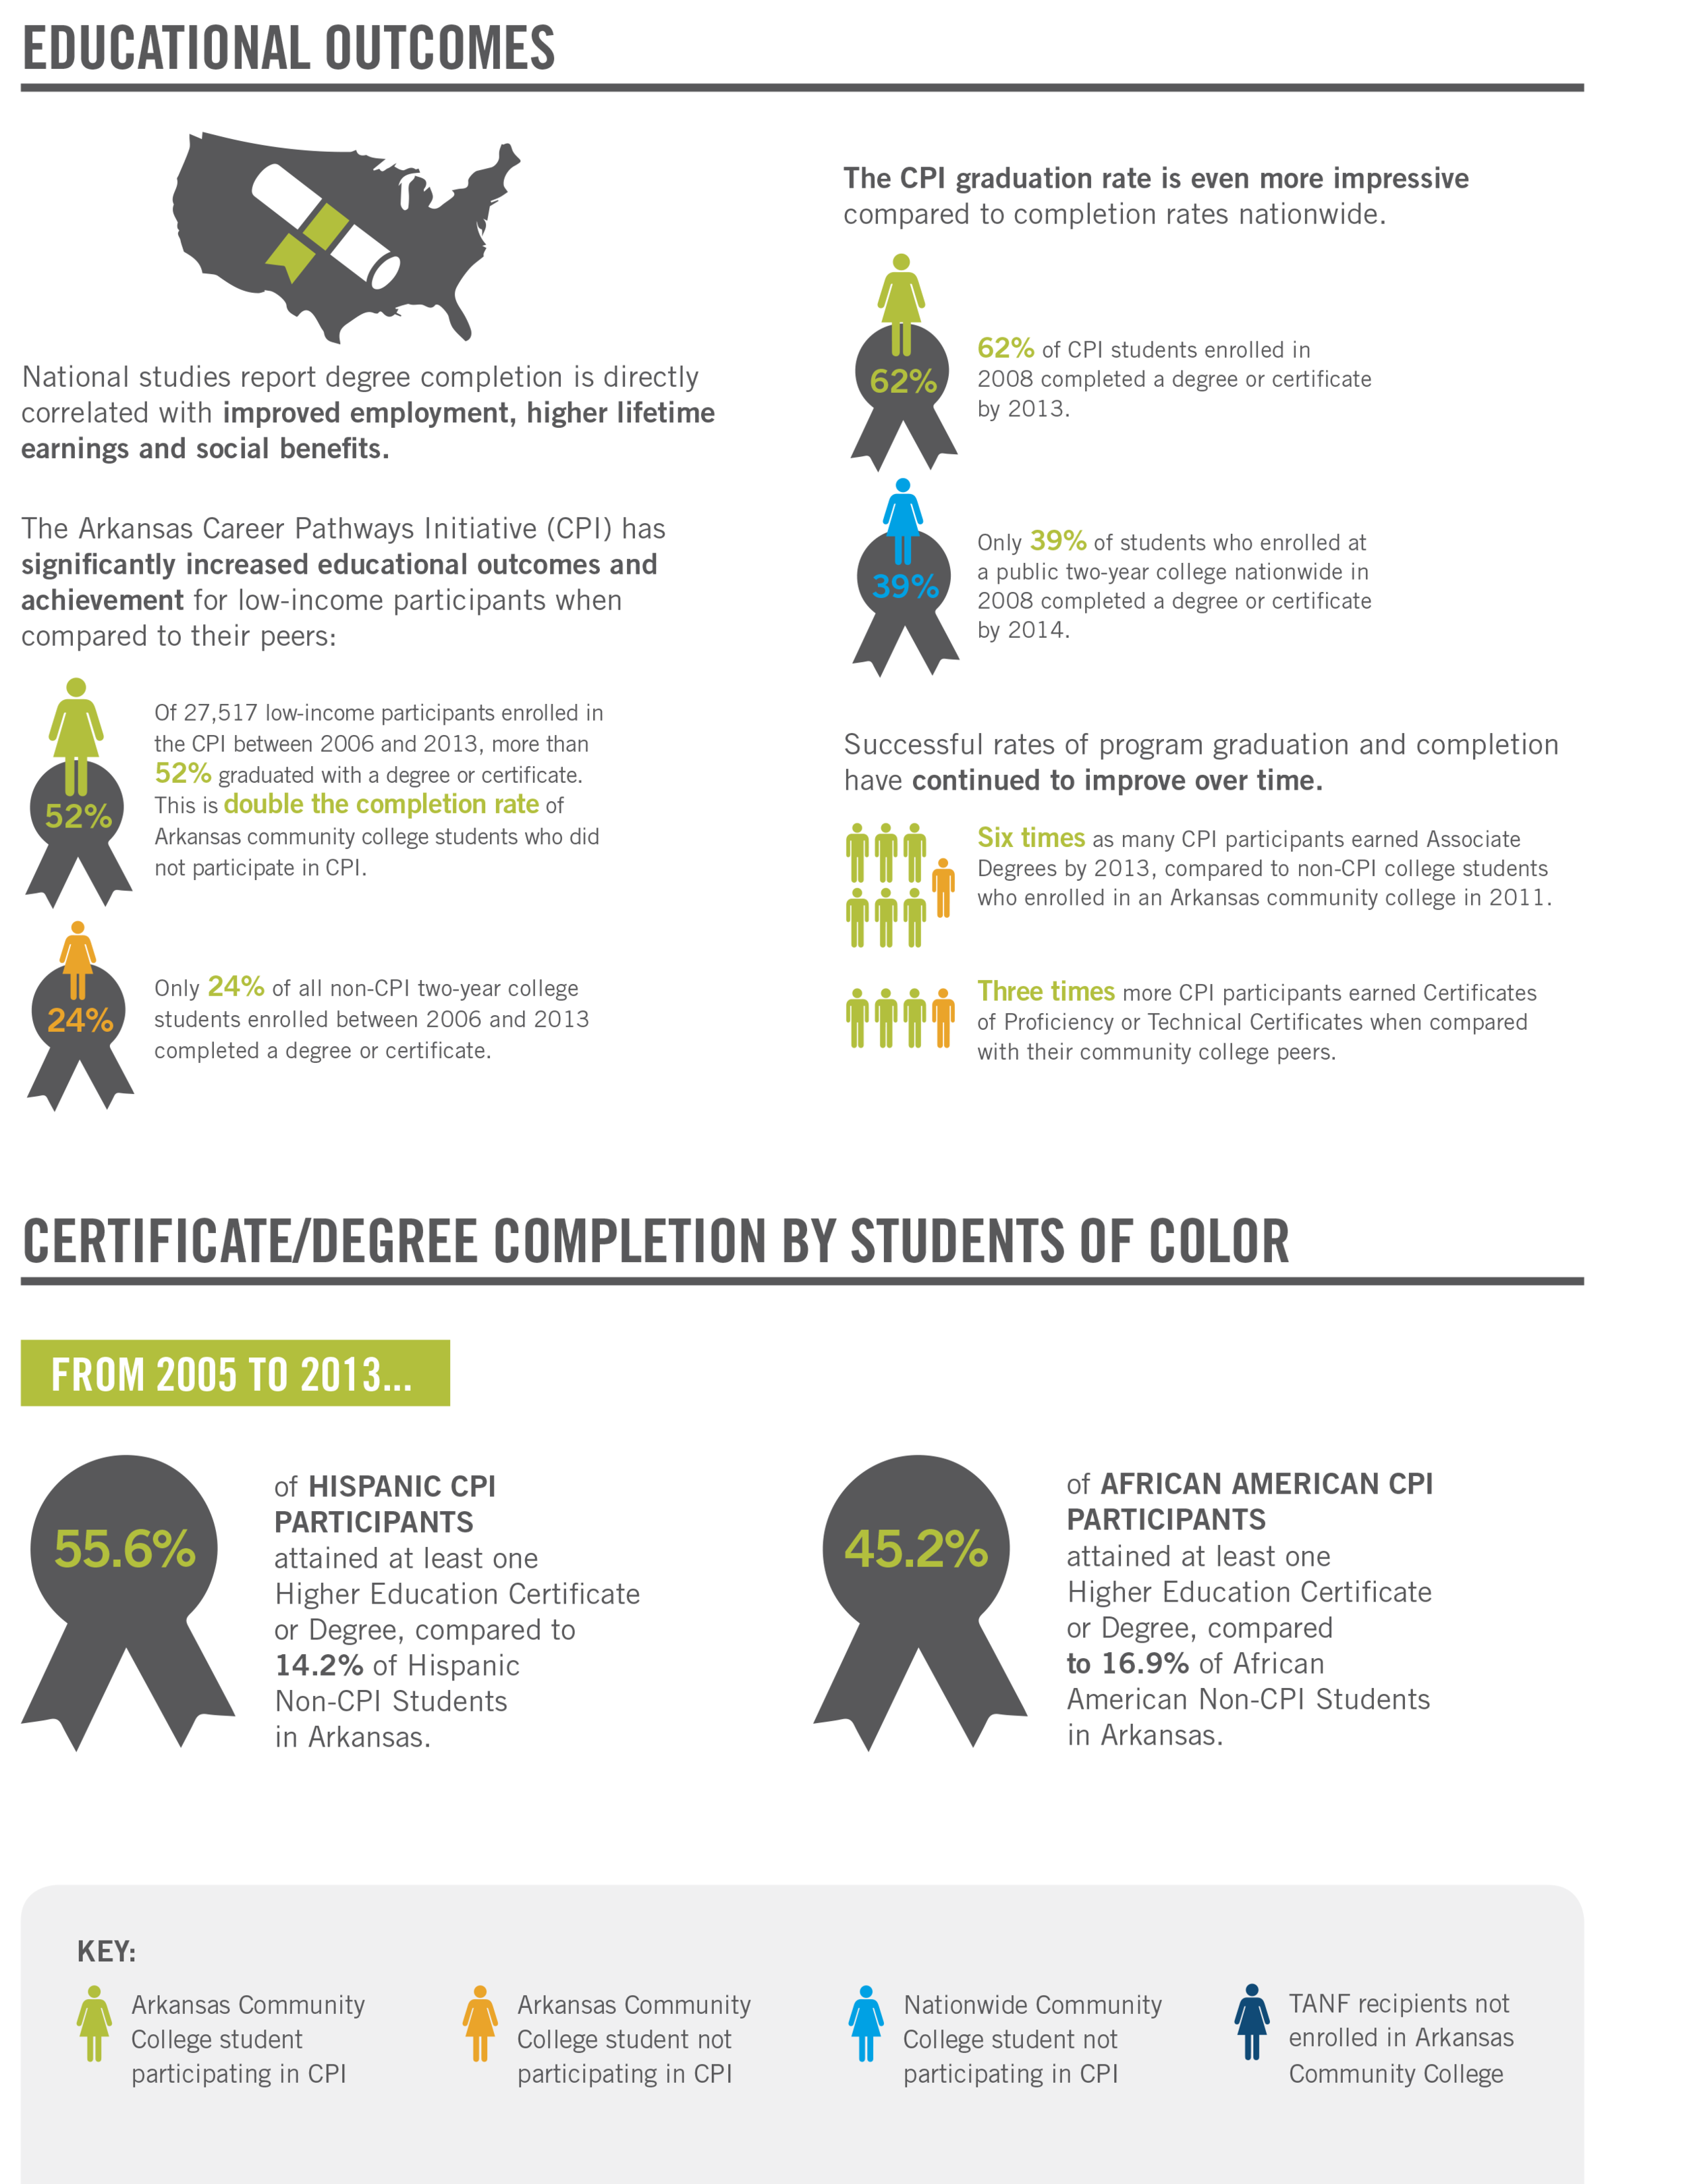 25023_dg_CollegeCounts_Infographic_ROI_11x17_m3_singles-2.png